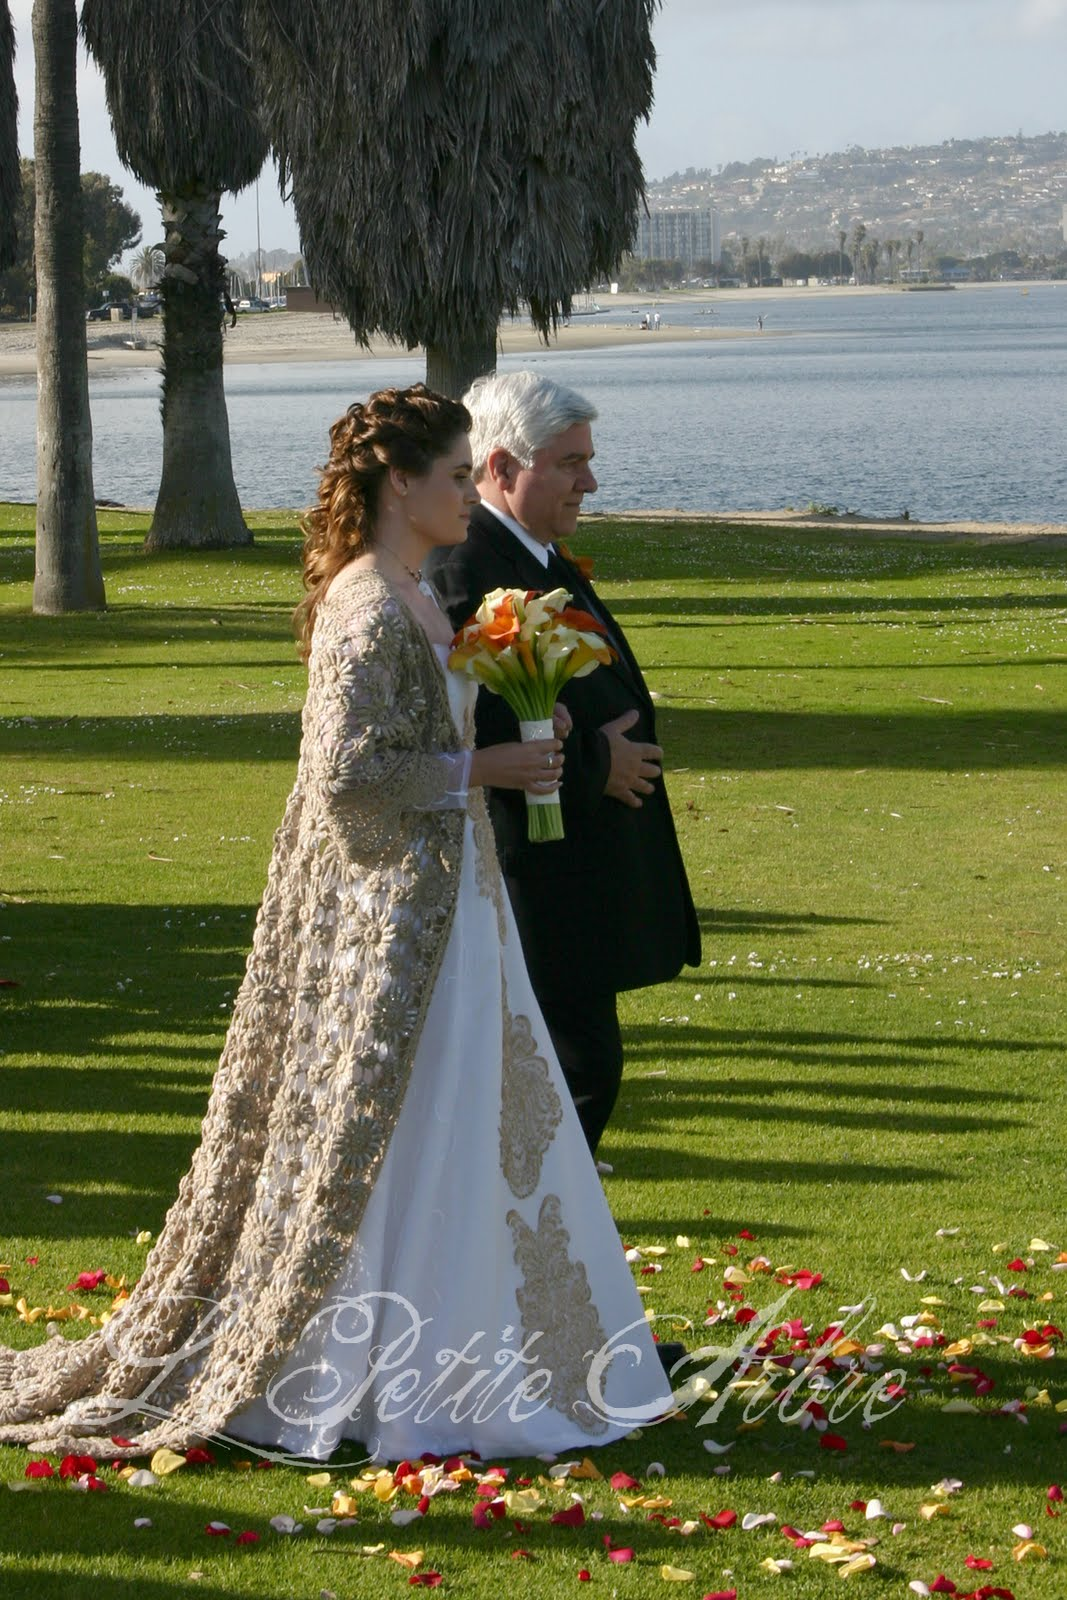 Le Petite Arbre: Star Wars Wedding Dress